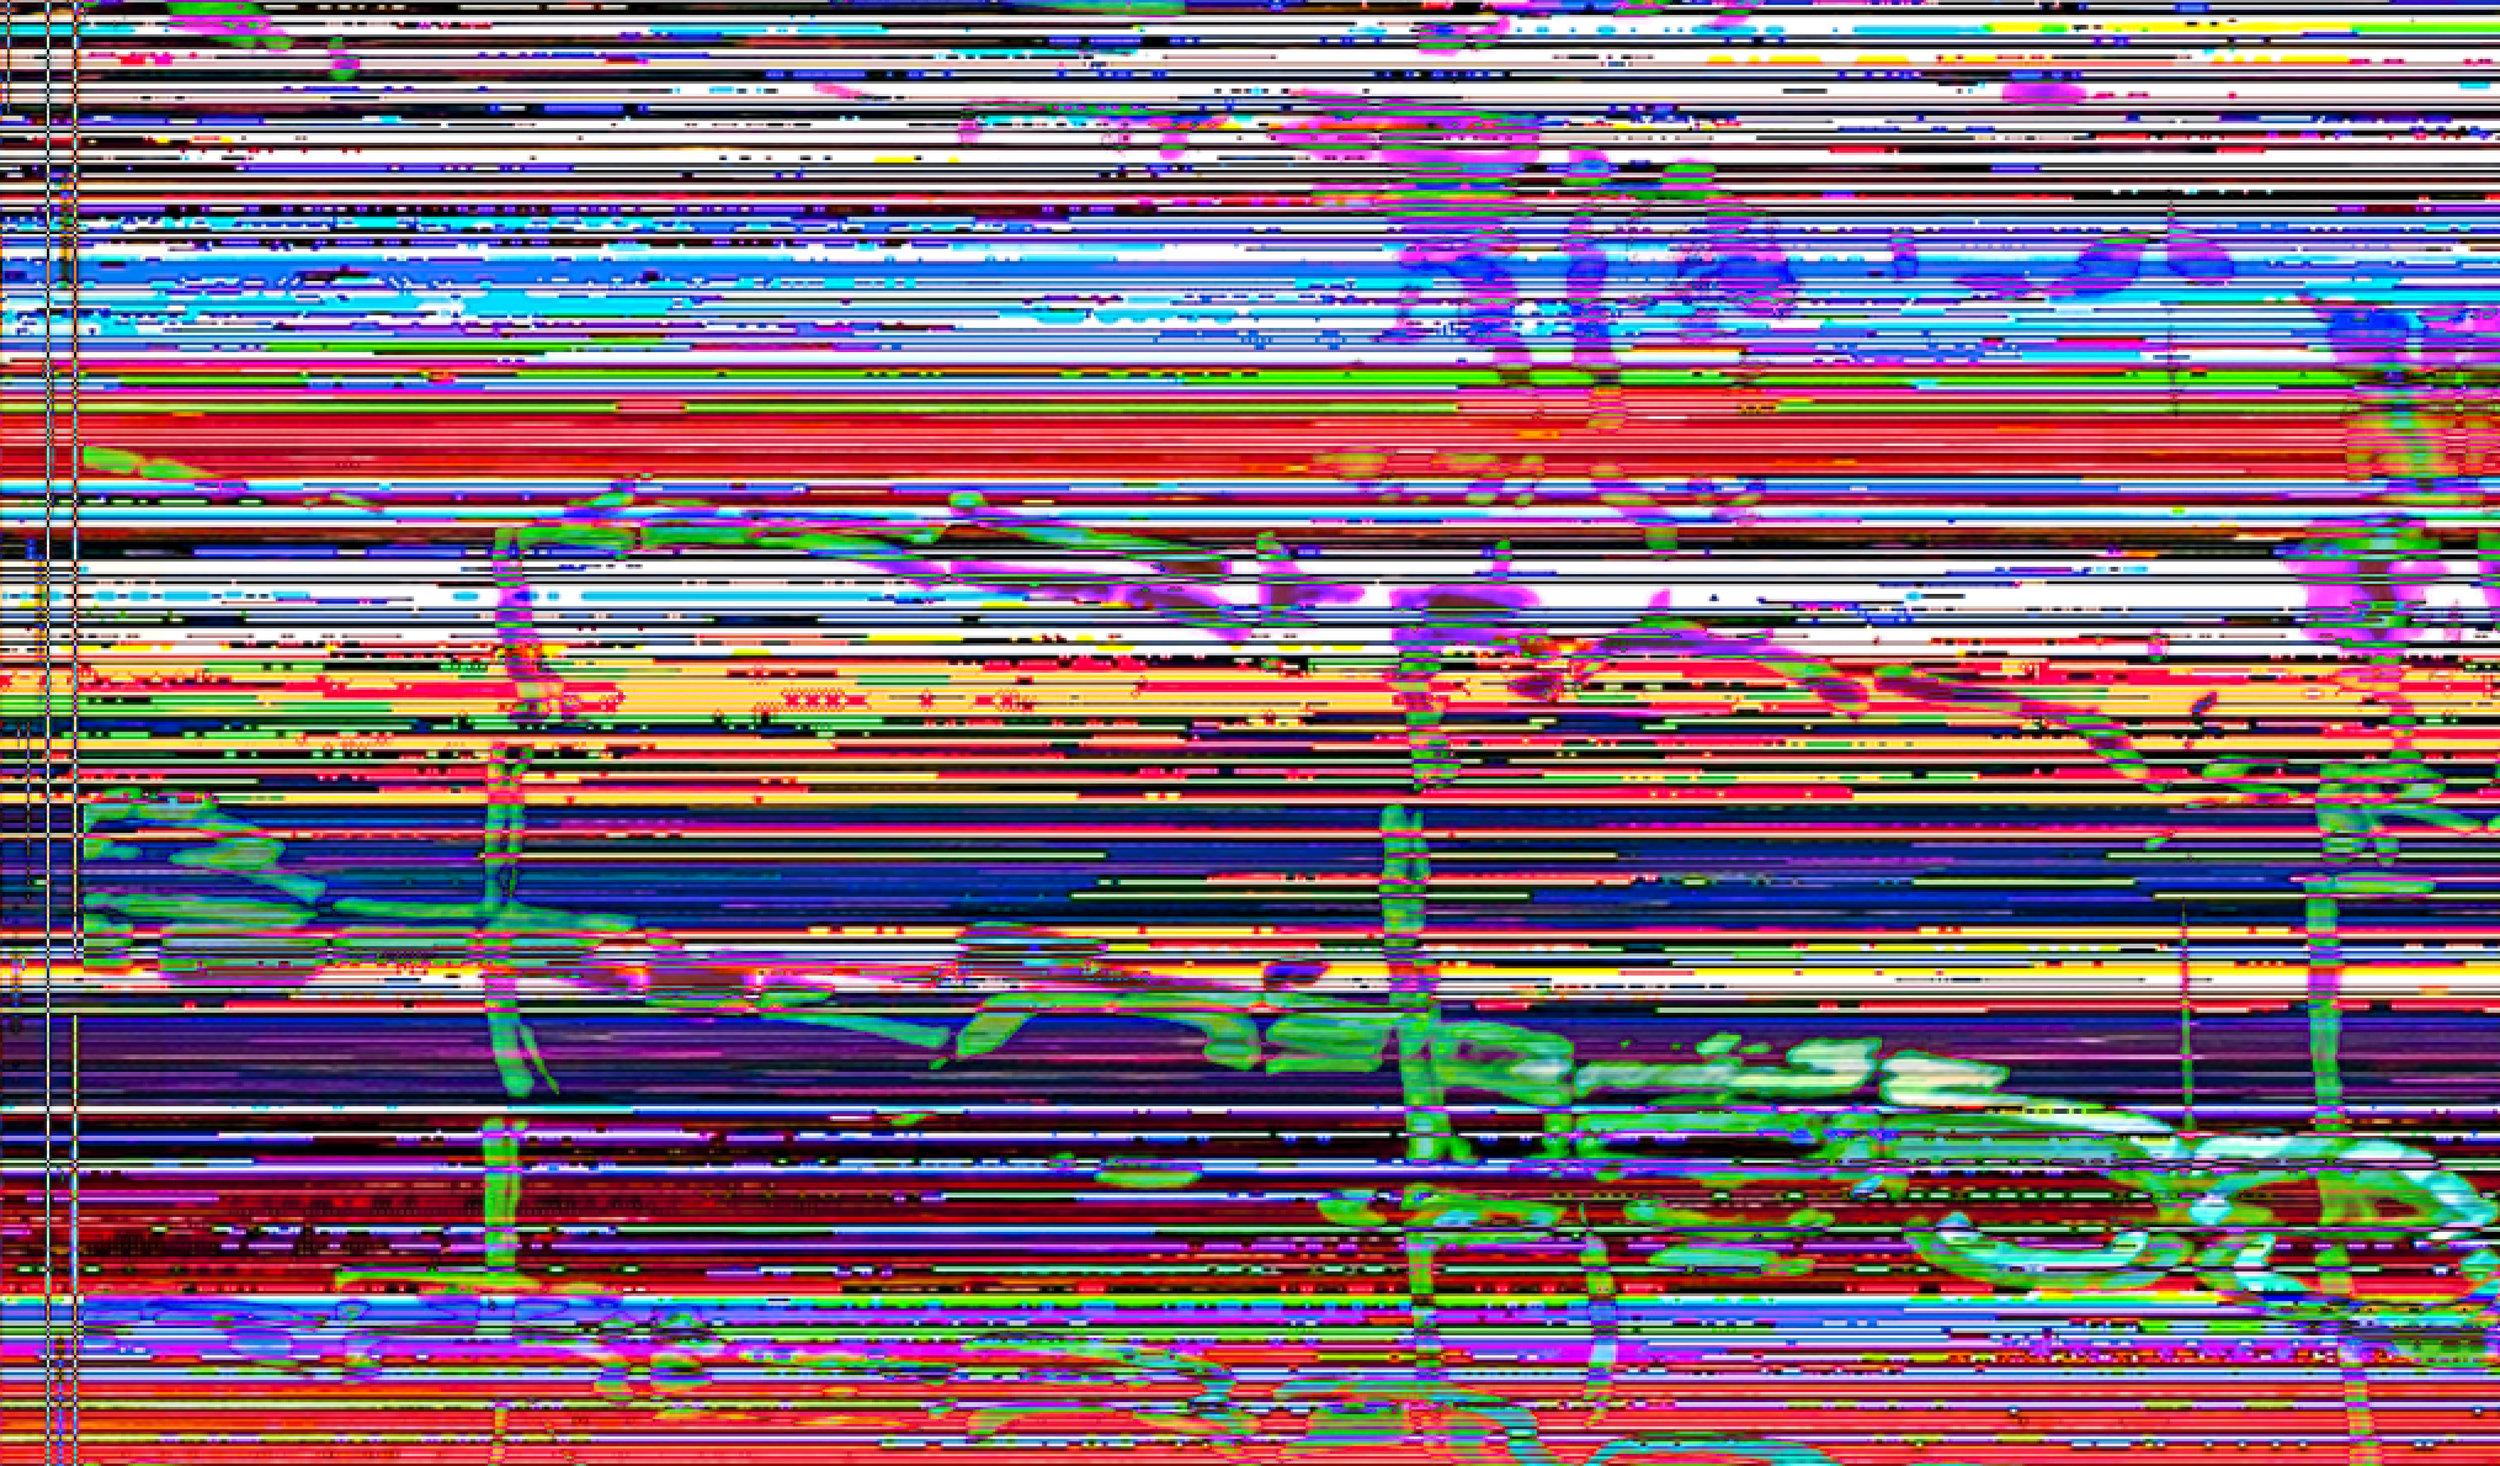 Untitled-8.2.jpg